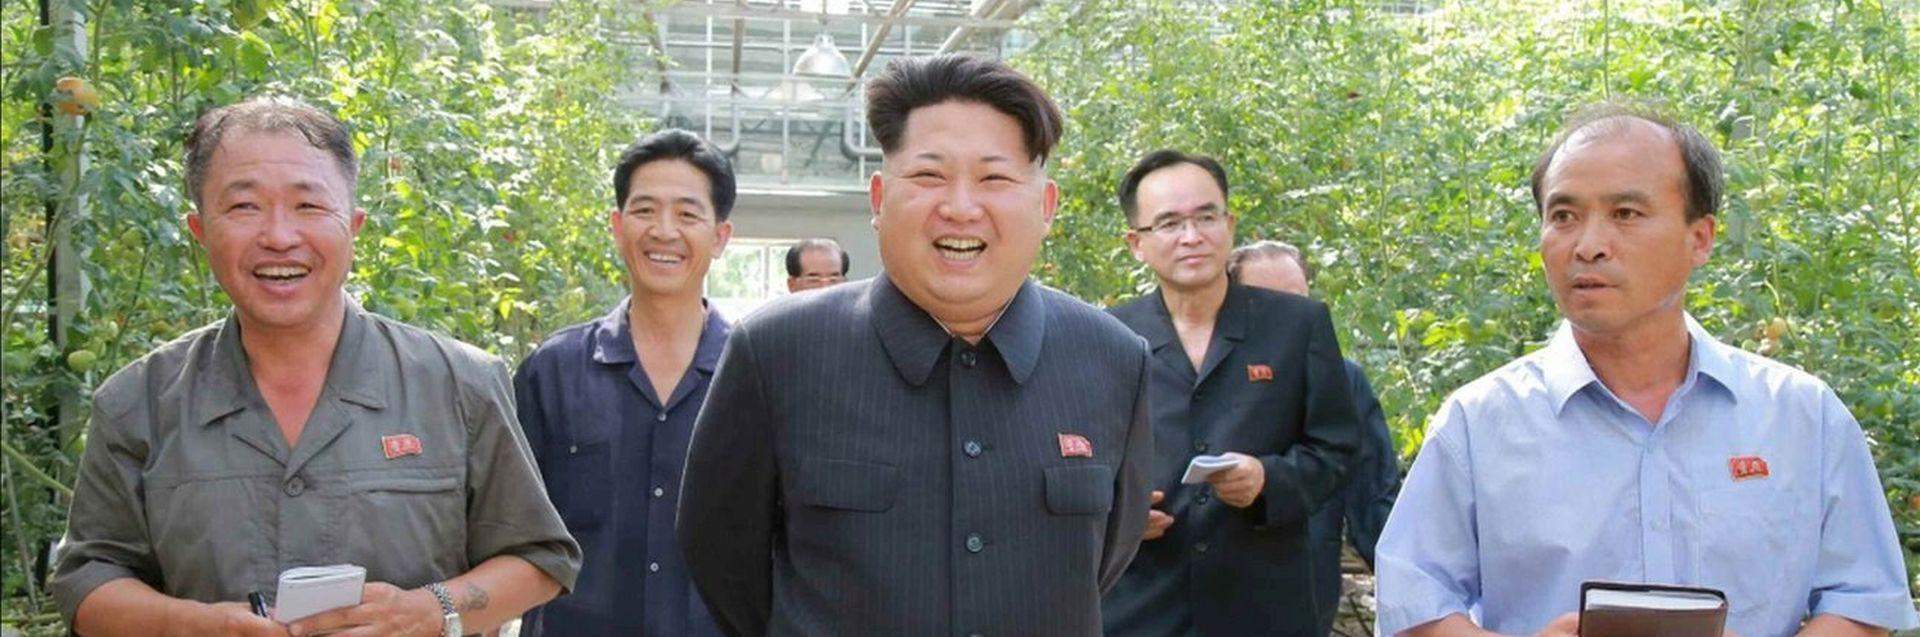 INCIDENT NA GRANICI Sjeverna Koreja 'upucala' južnokorejske zvučnike